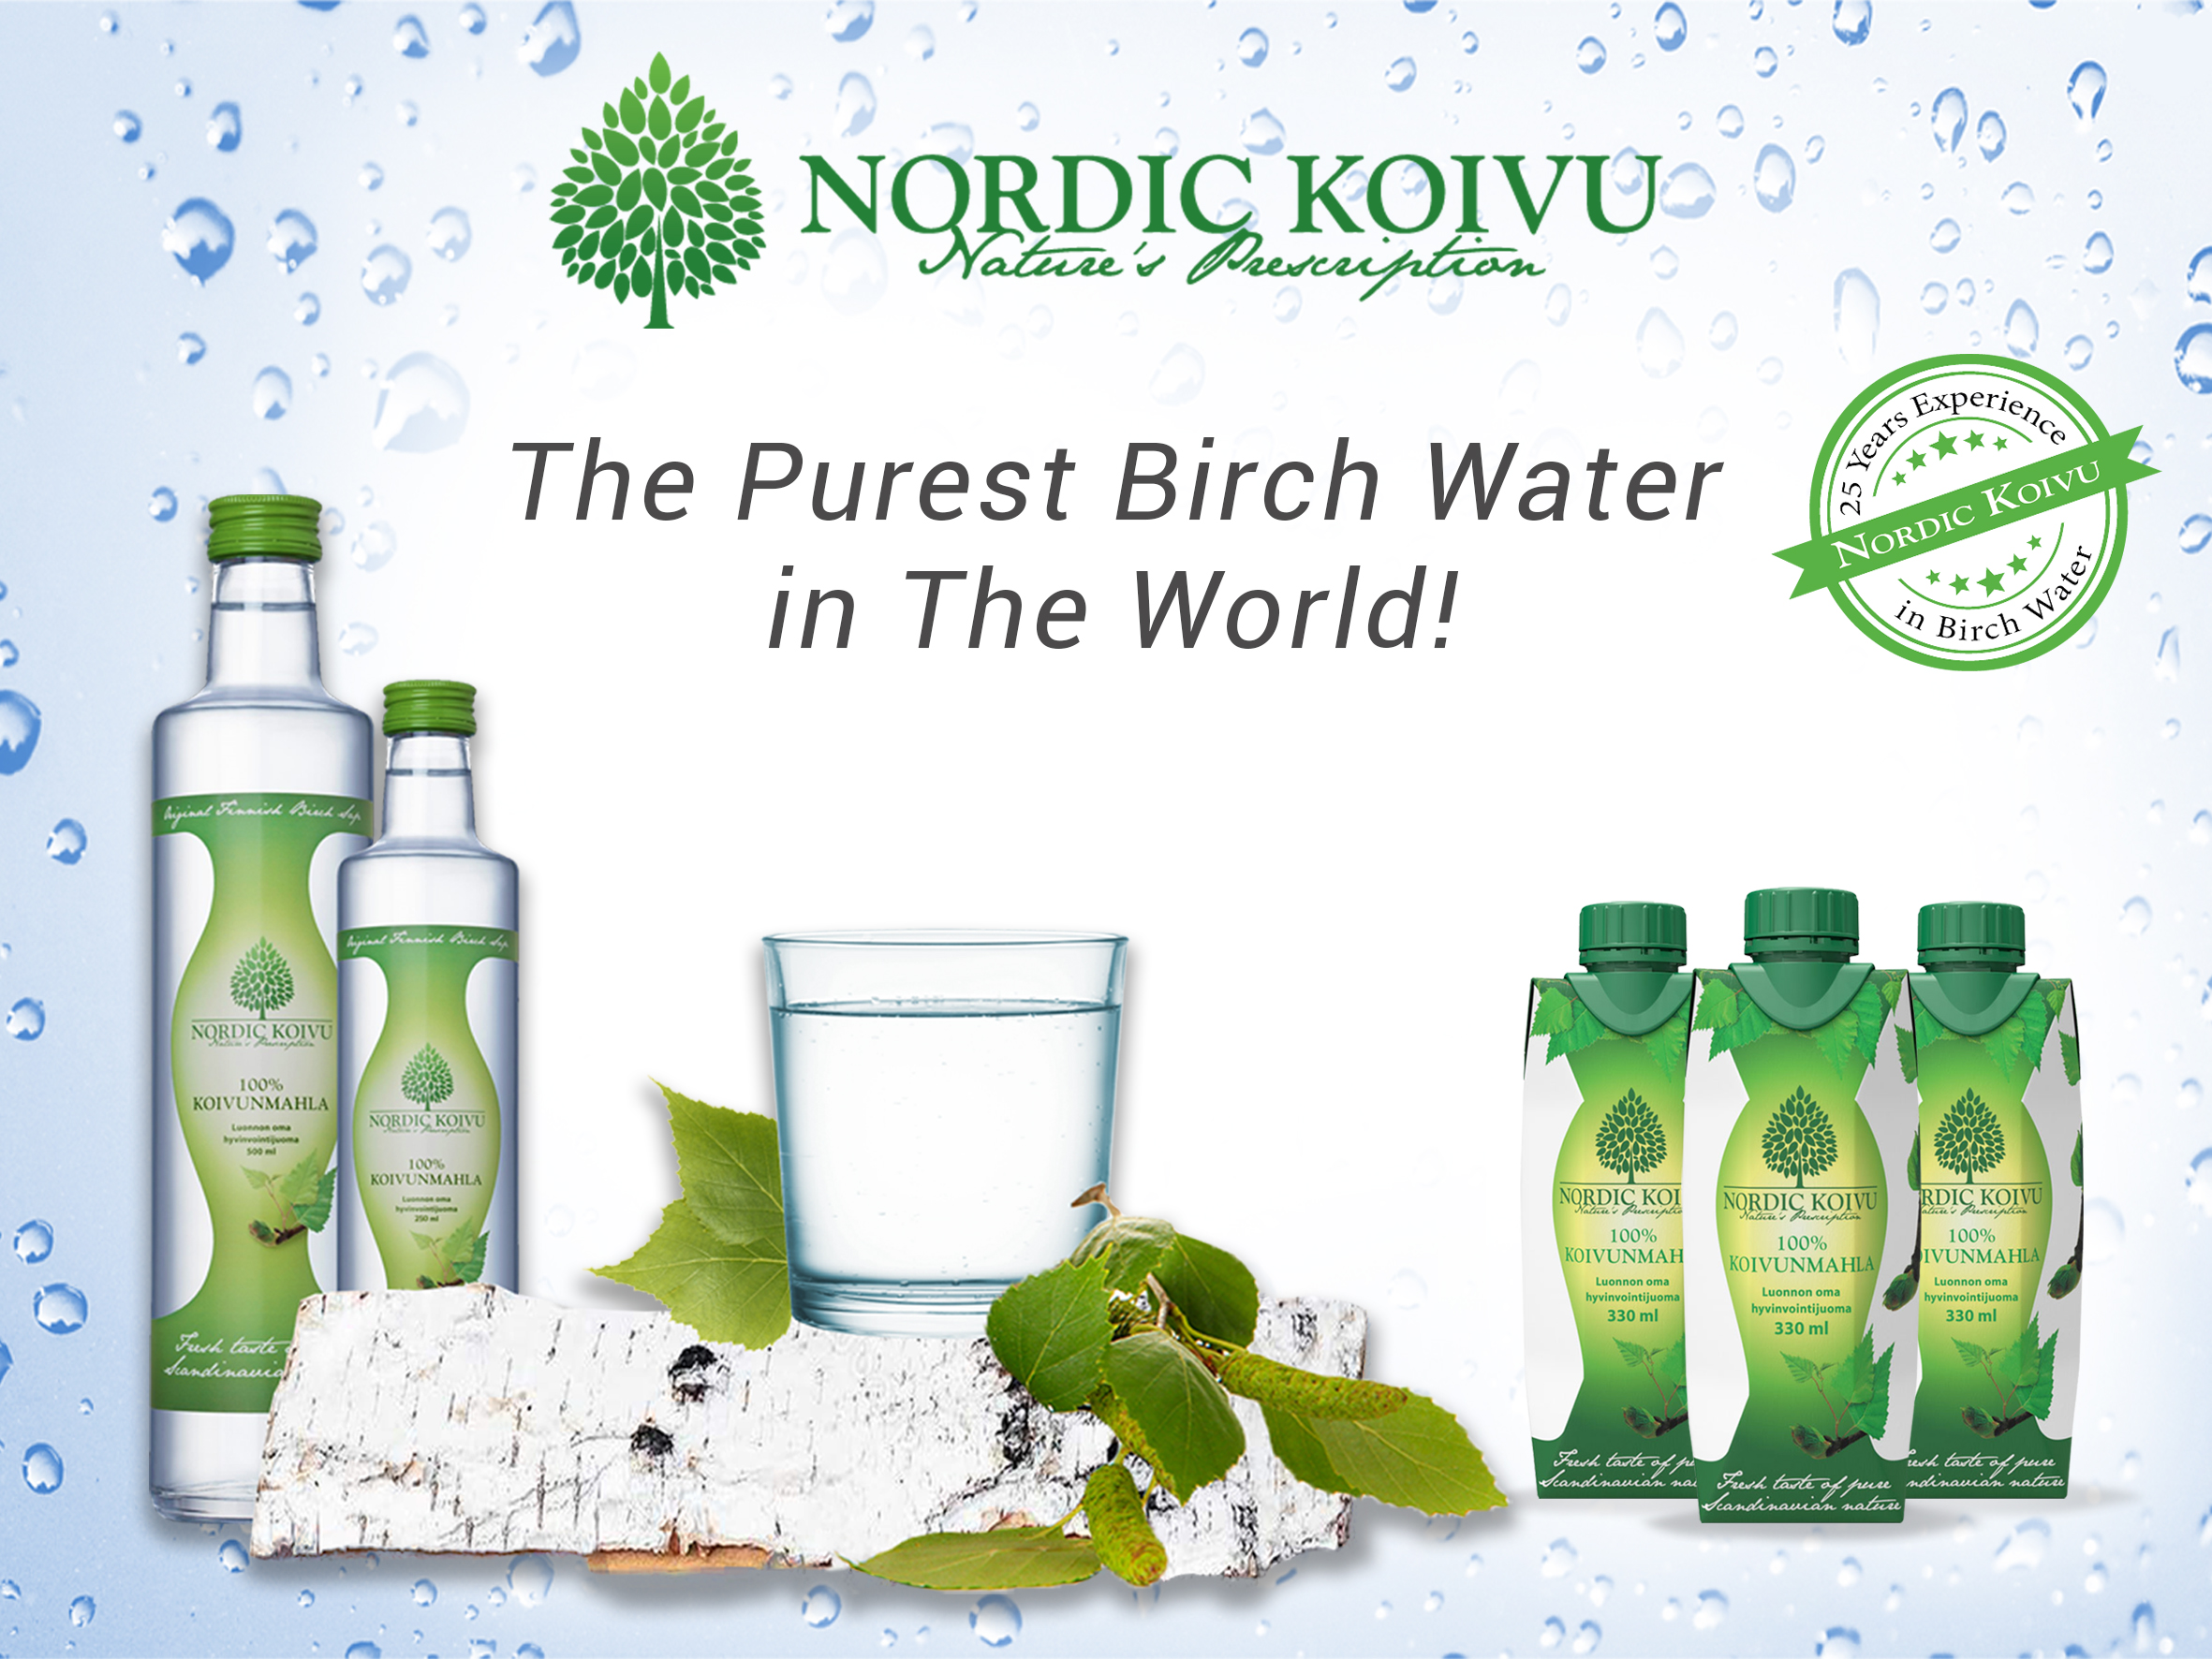 Nordic Koivu Ltd